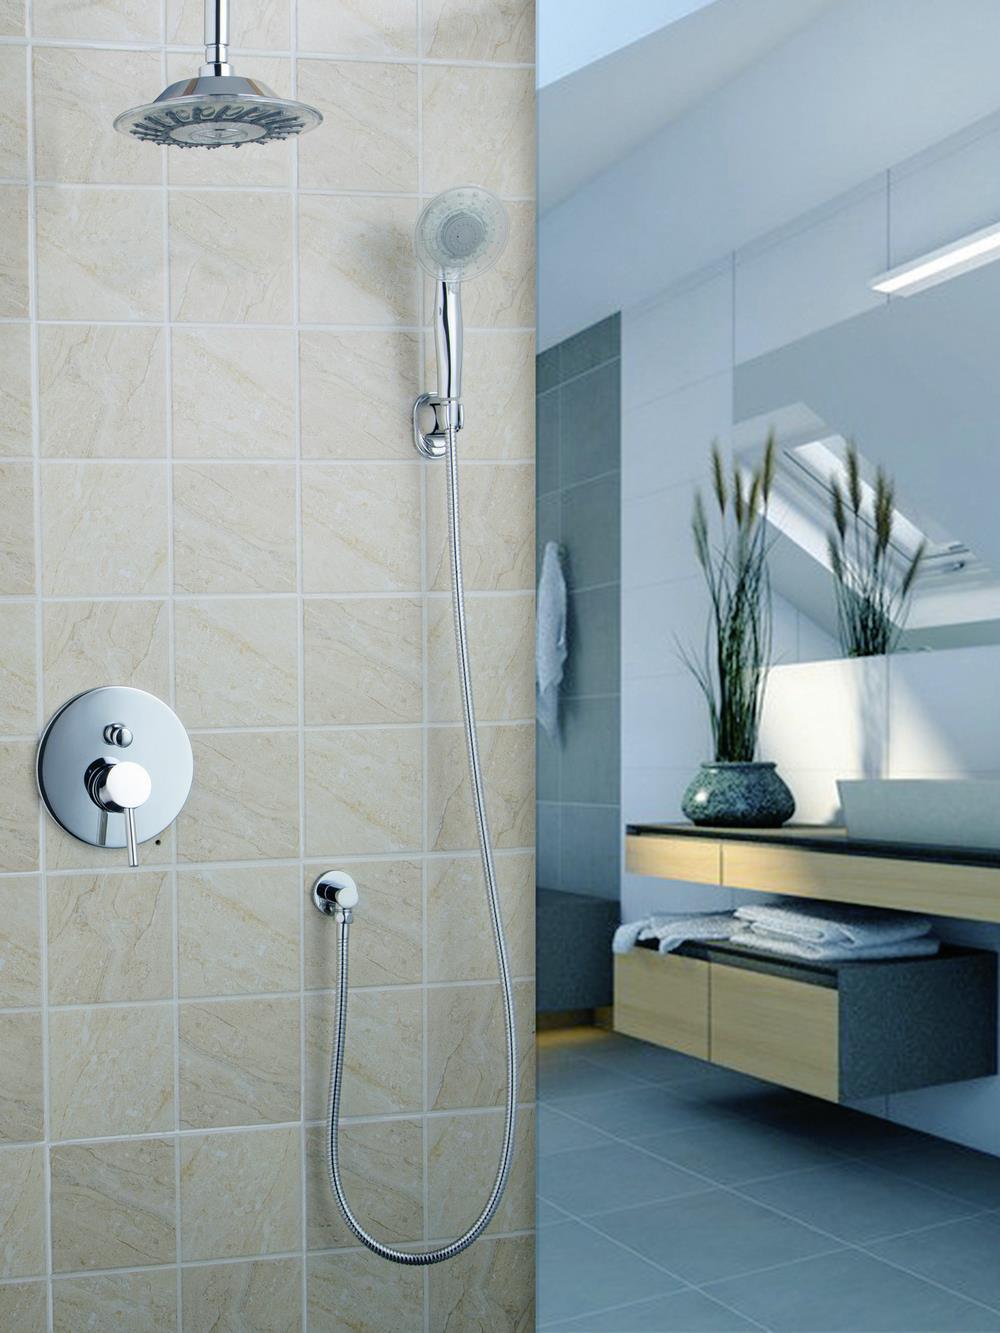 Monite New Shower Set Torneira 8Shower Head Bathroom Rain Rain Shower Set Chrome Polished 50243-22A Bathtub Faucet,Mixer Tap thermostatic faucet 50271 wall mount bathroom 8 rain shower head chrome heldhead shower faucet set bathtub mixer tap torneira